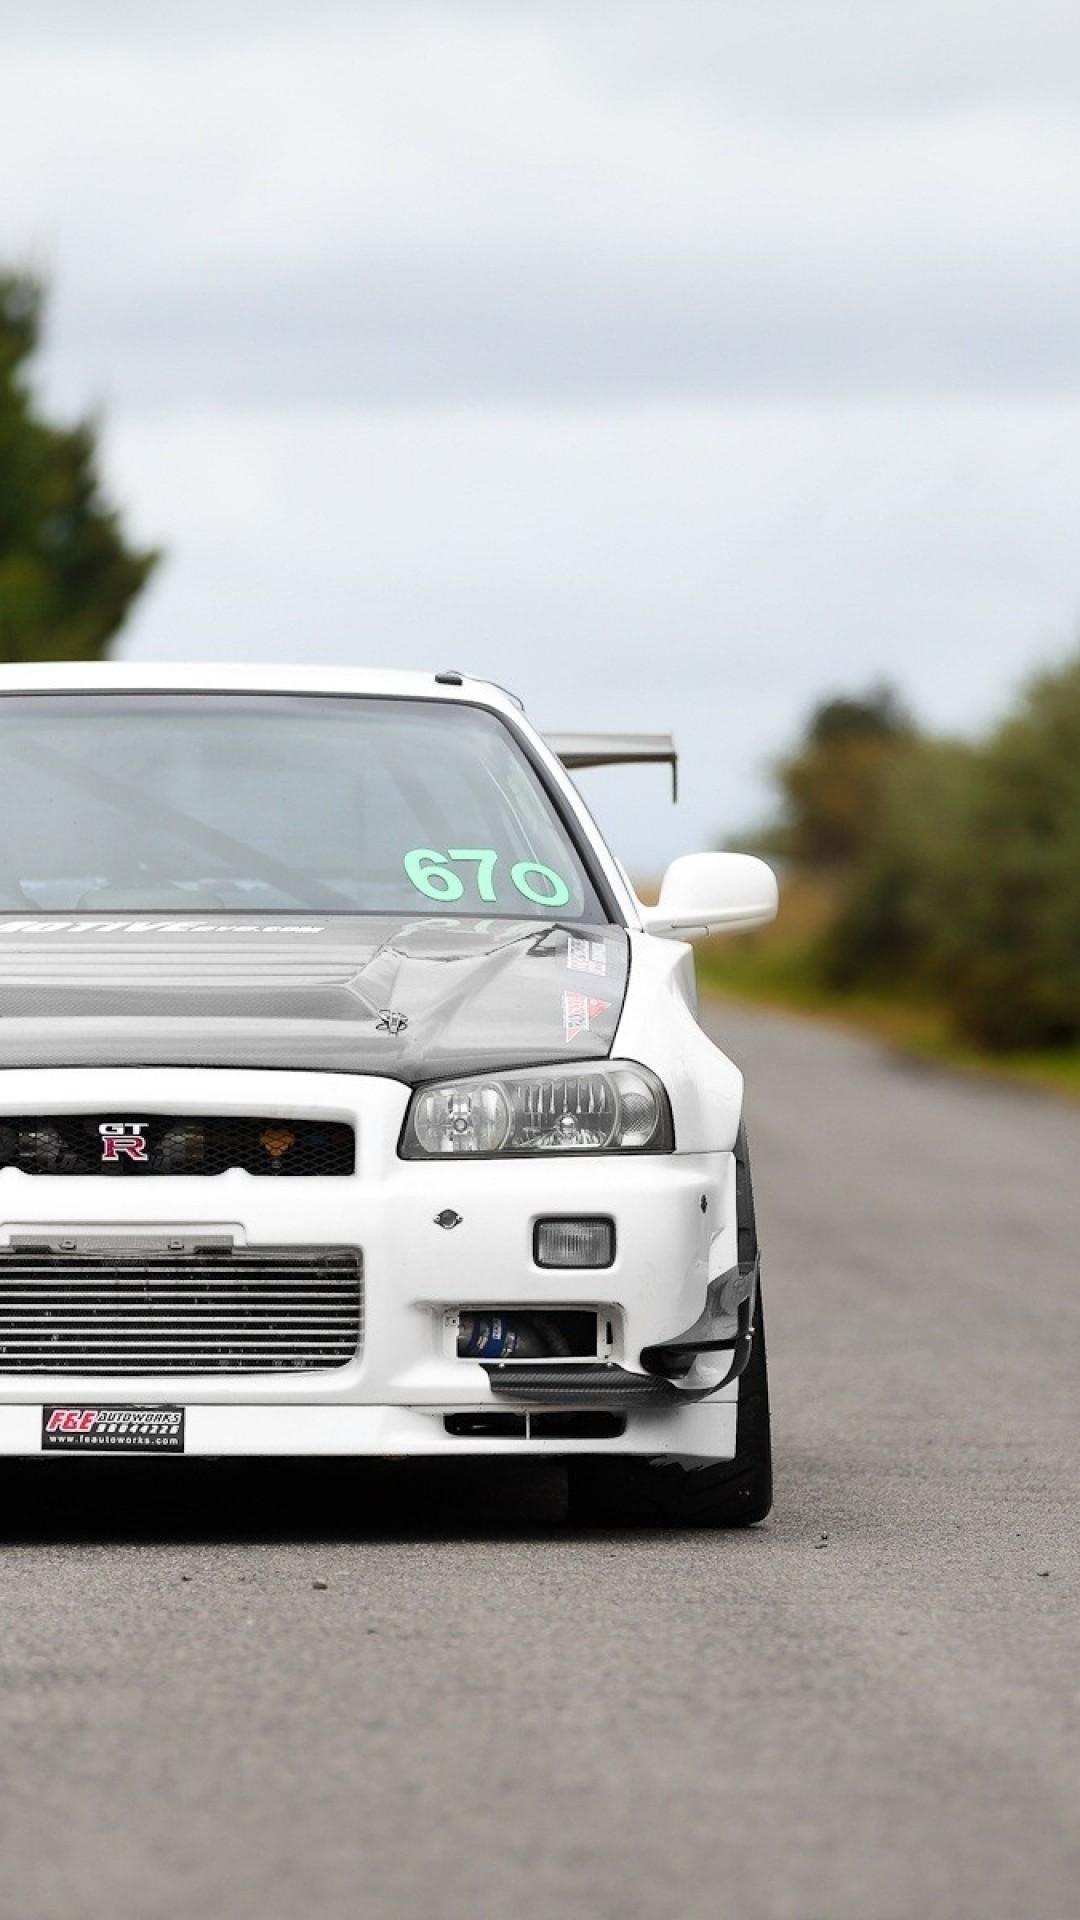 Nissan Skyline Gt-r, Rally, Cars, White